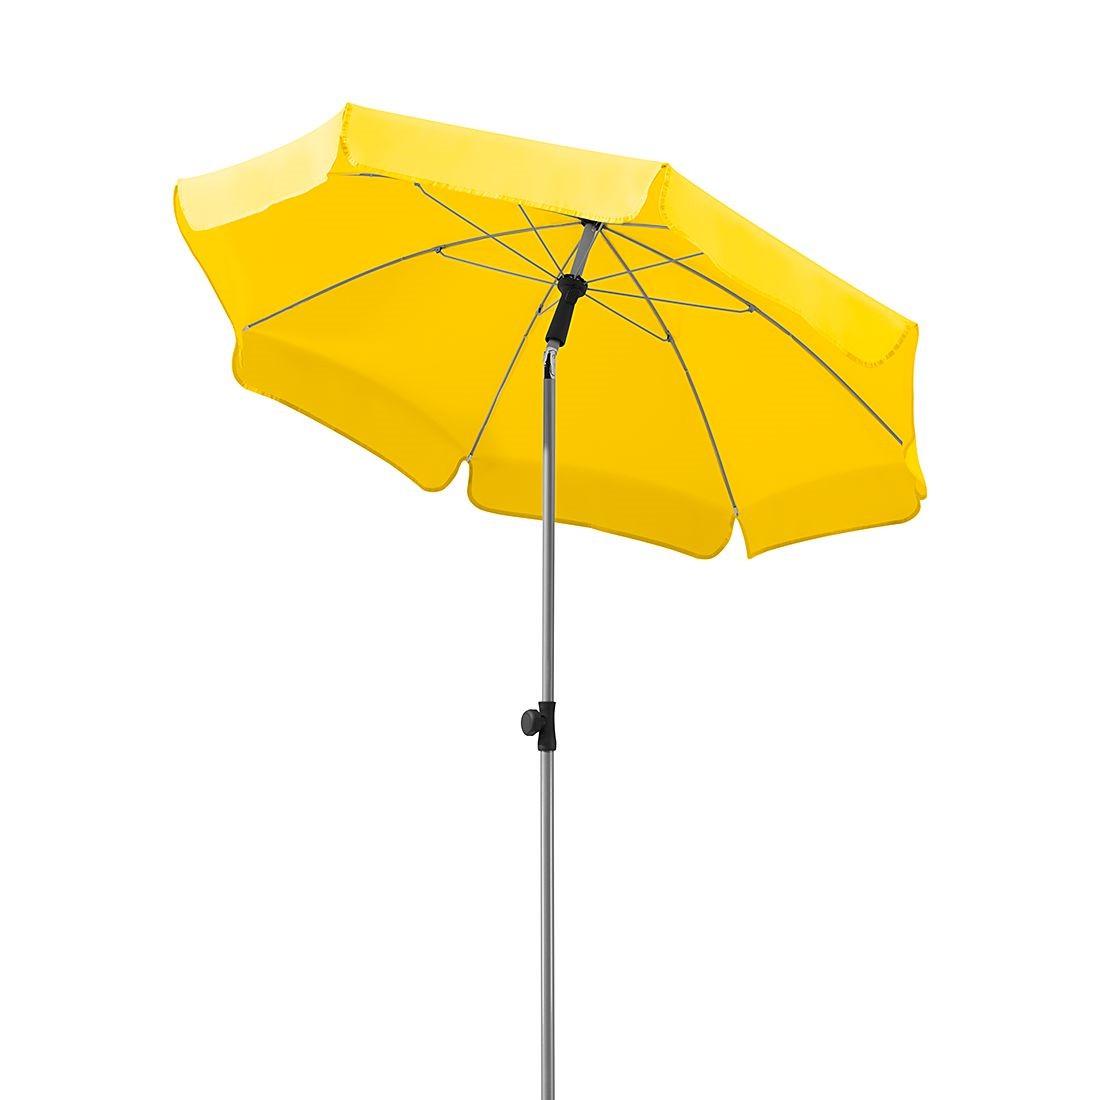 Parasol Micco I - staal/polyester - zilverkeurig/citruskleurig, Schneider Schirme